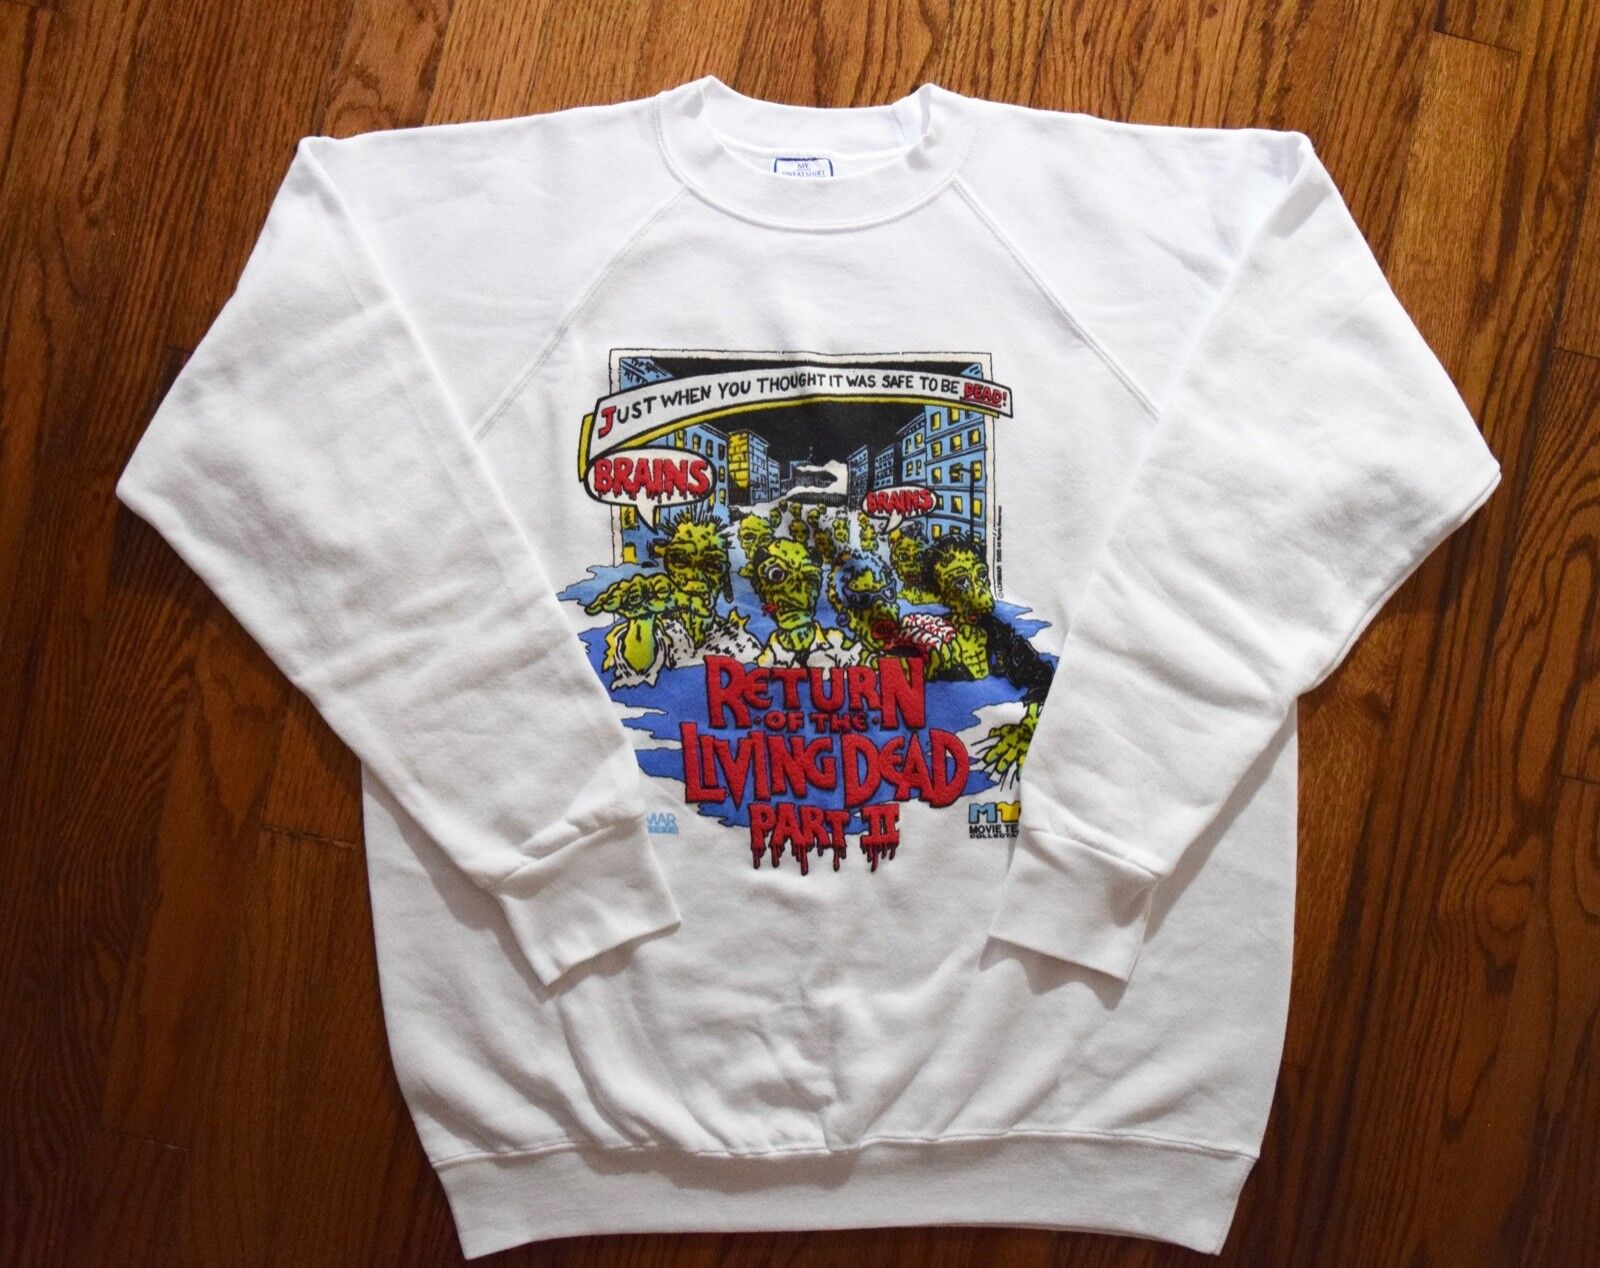 1988 RETURN OF THE LIVING DEAD PART 2 sweat shirt vtg 80s cult horror movie